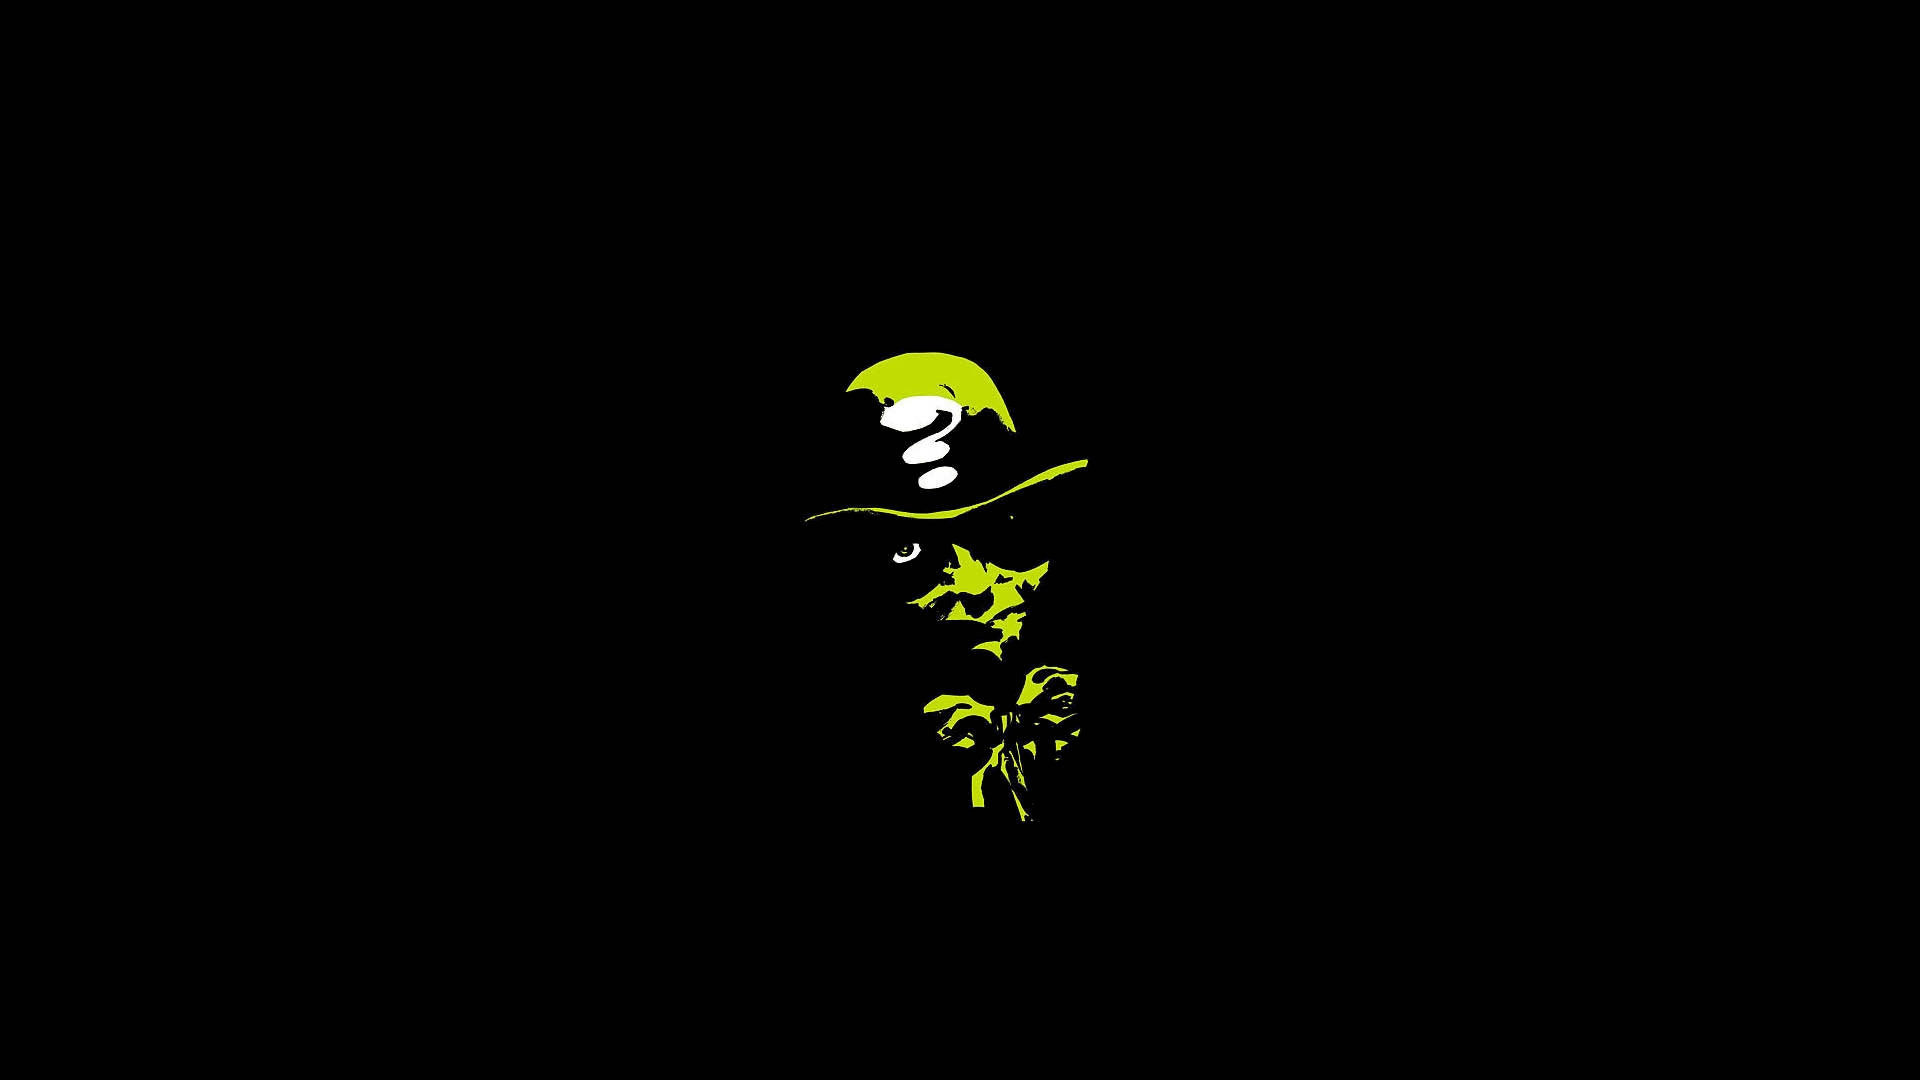 Riddler hd wallpaper background image 1920x1080 id for Sfondi batman